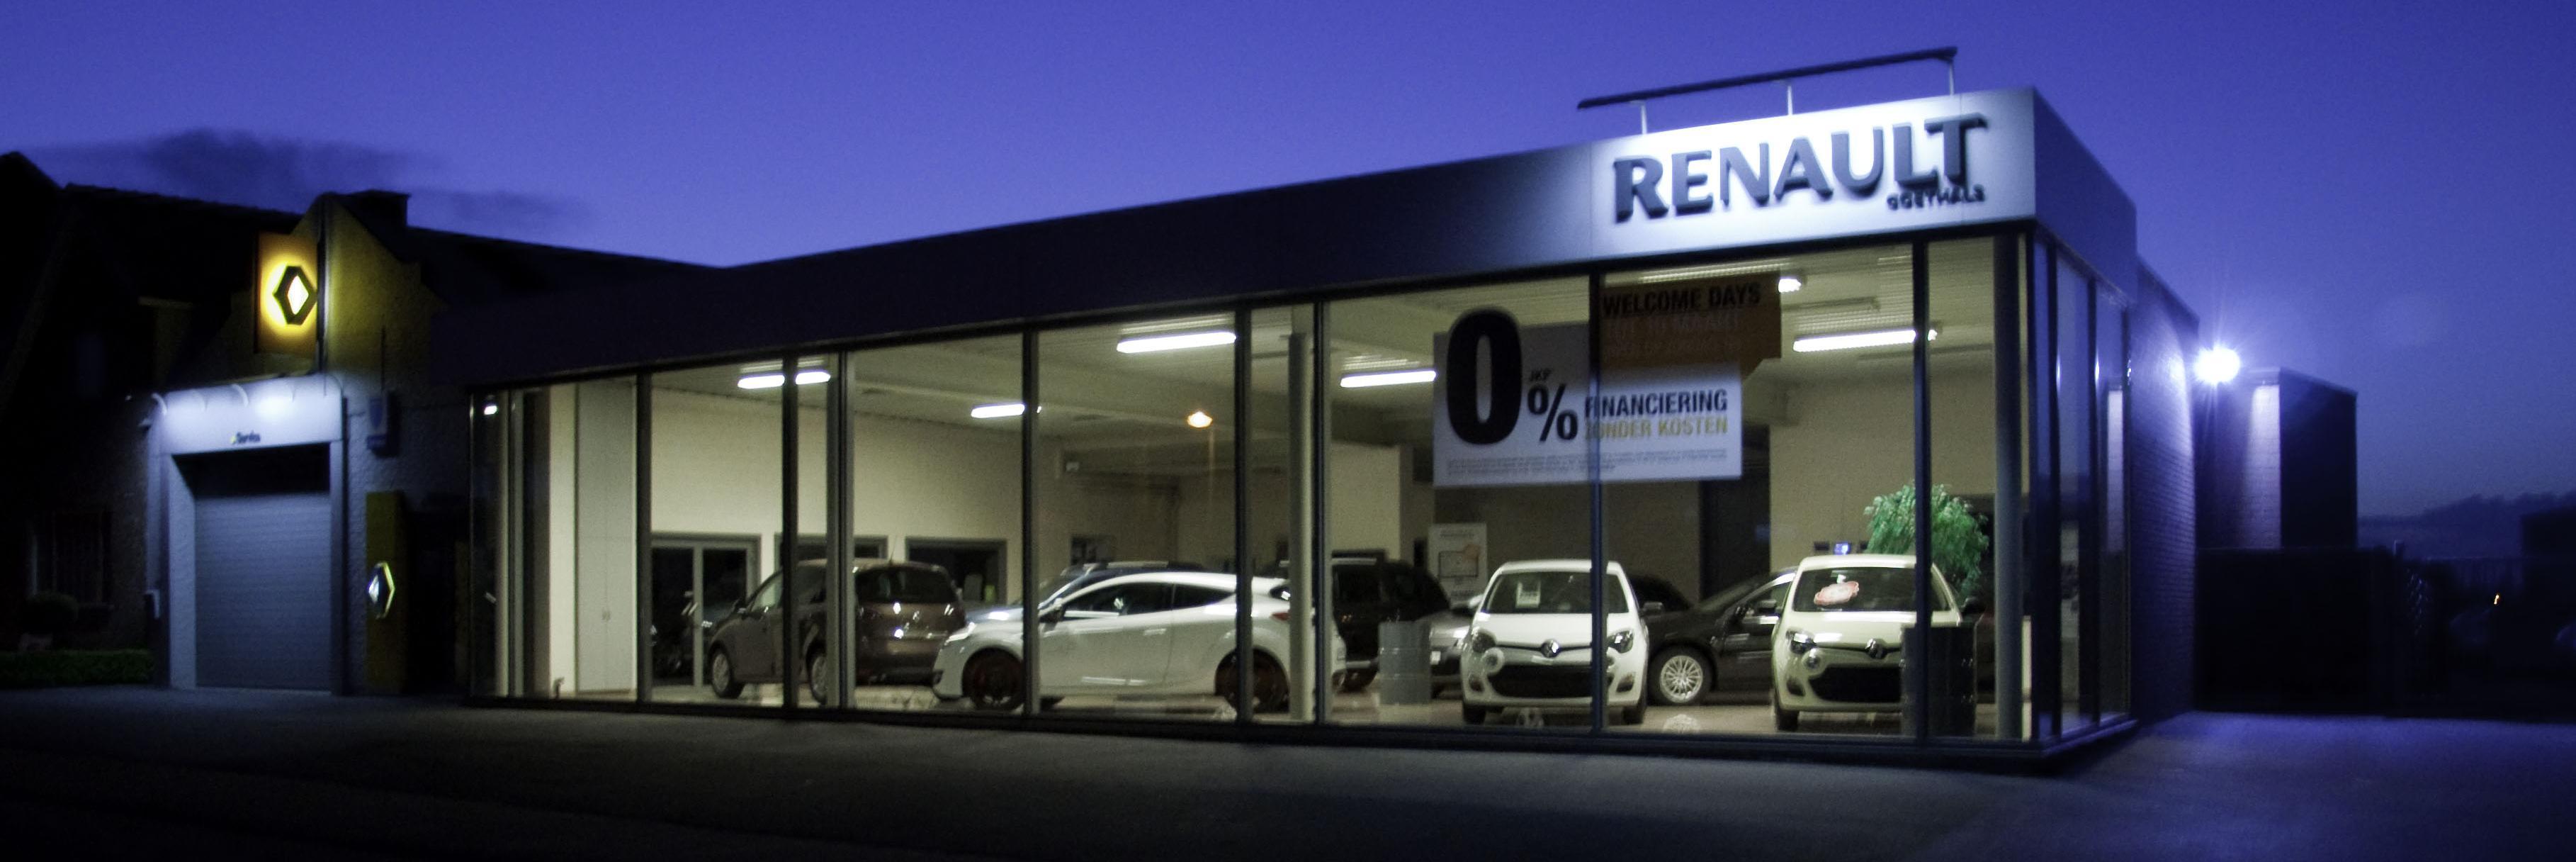 Renault - garage goethals - wingene